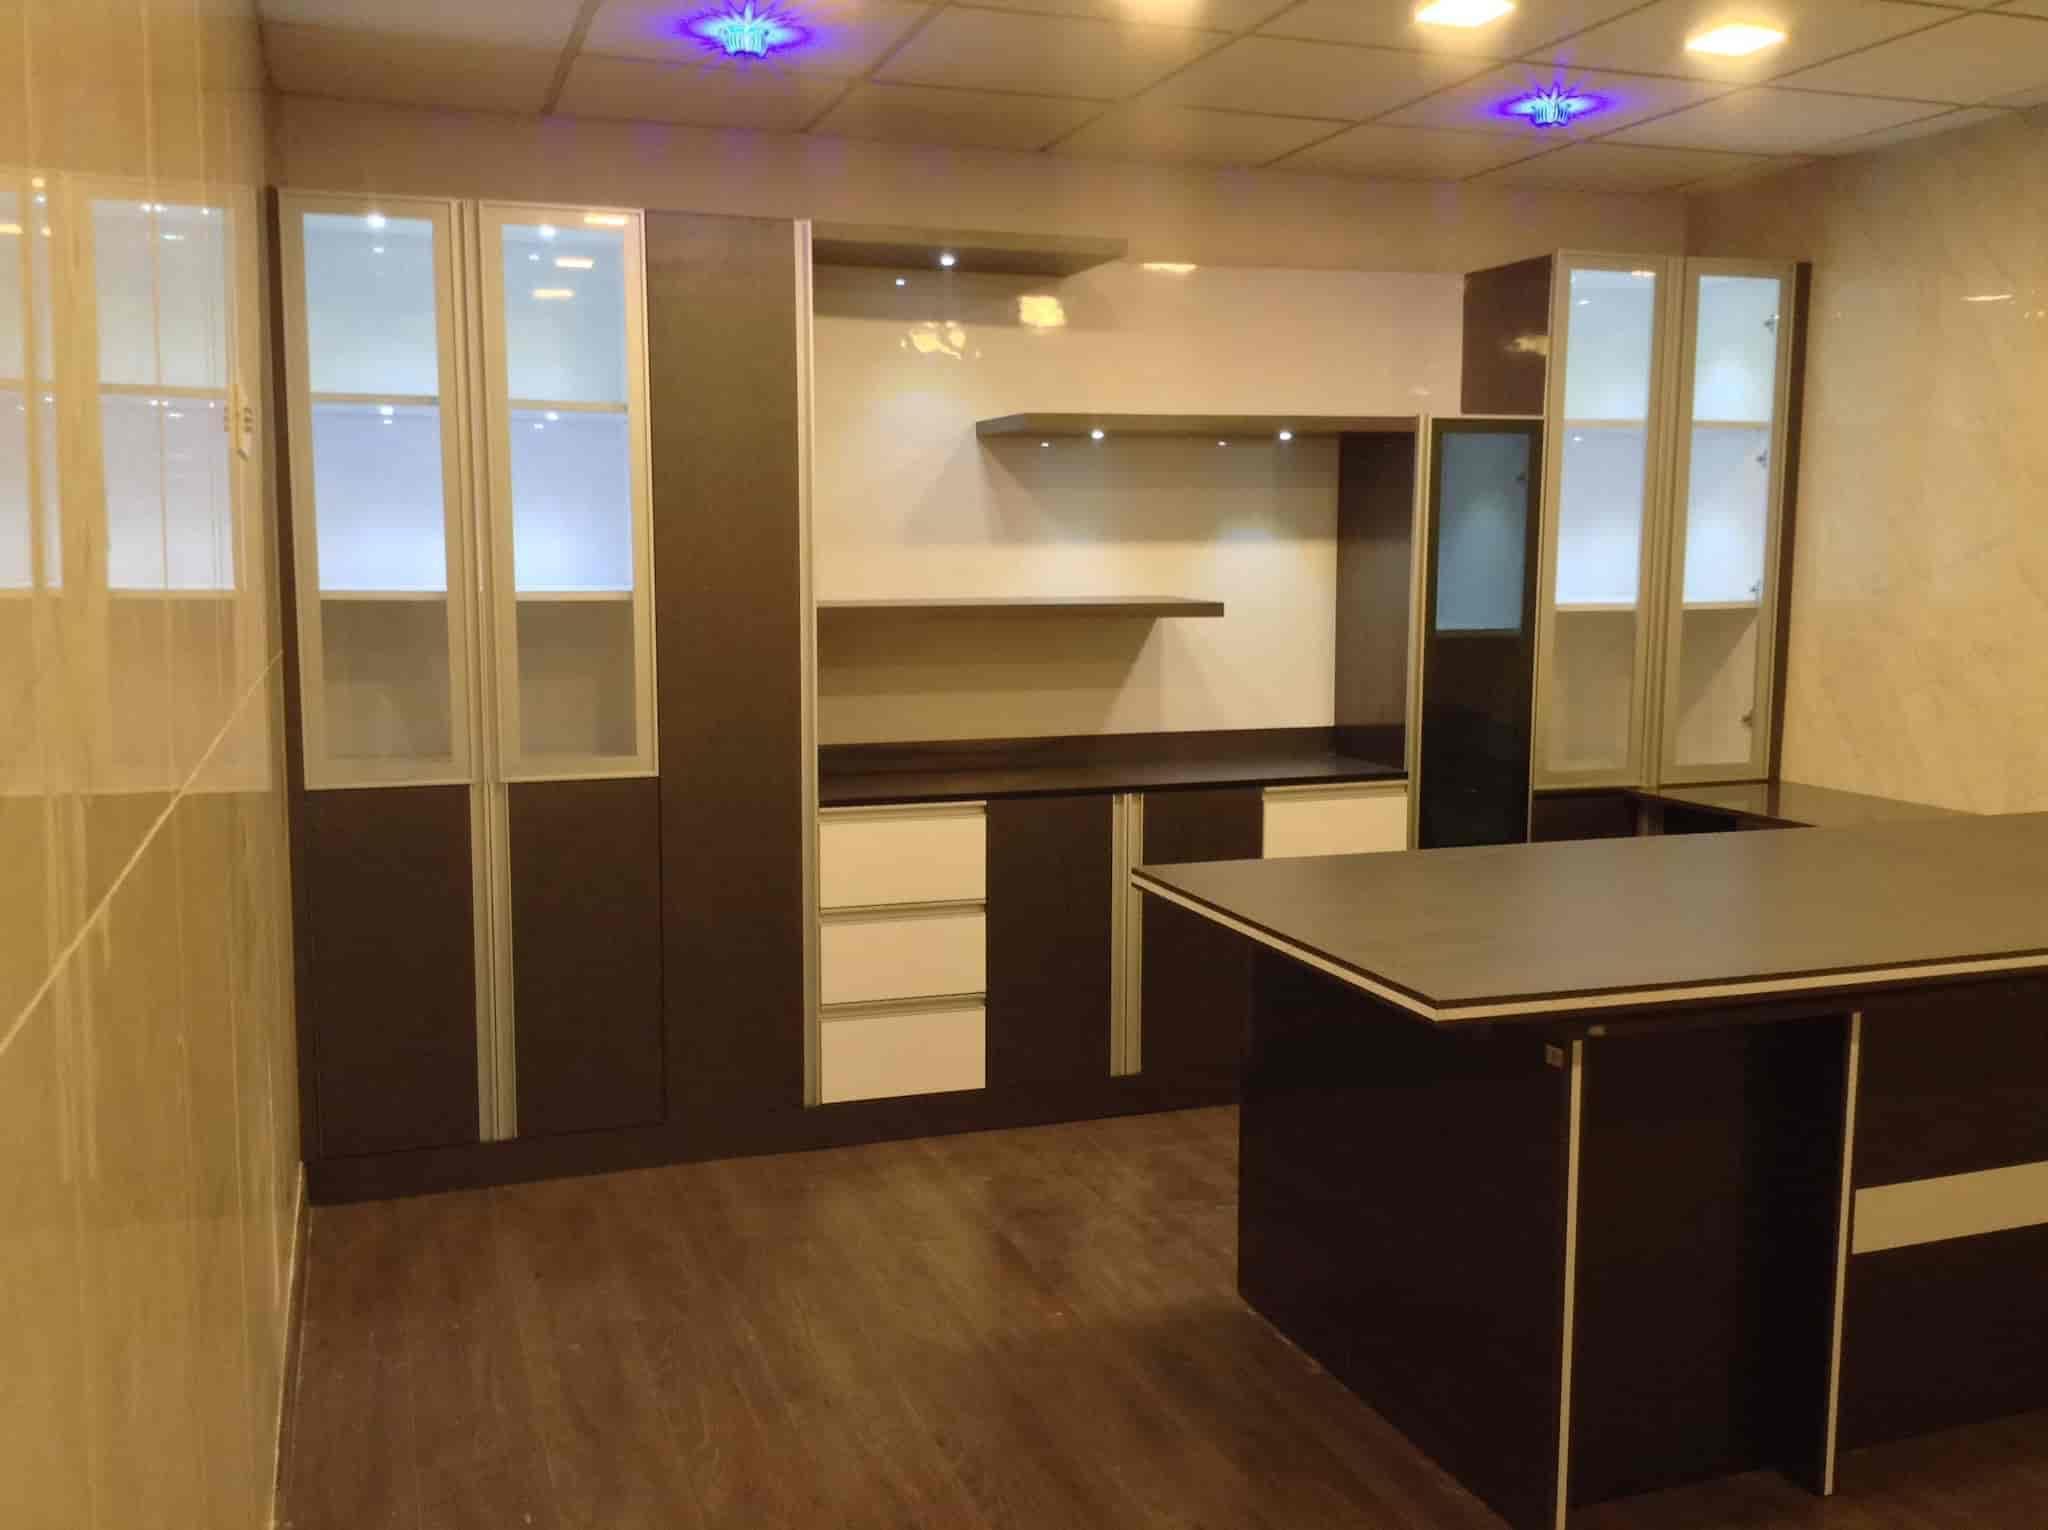 ... Modular Kitchen Design   Surmise Interiors Modular Kitchen Photos,  Arumbakkam, Chennai   Interior Decorators ...